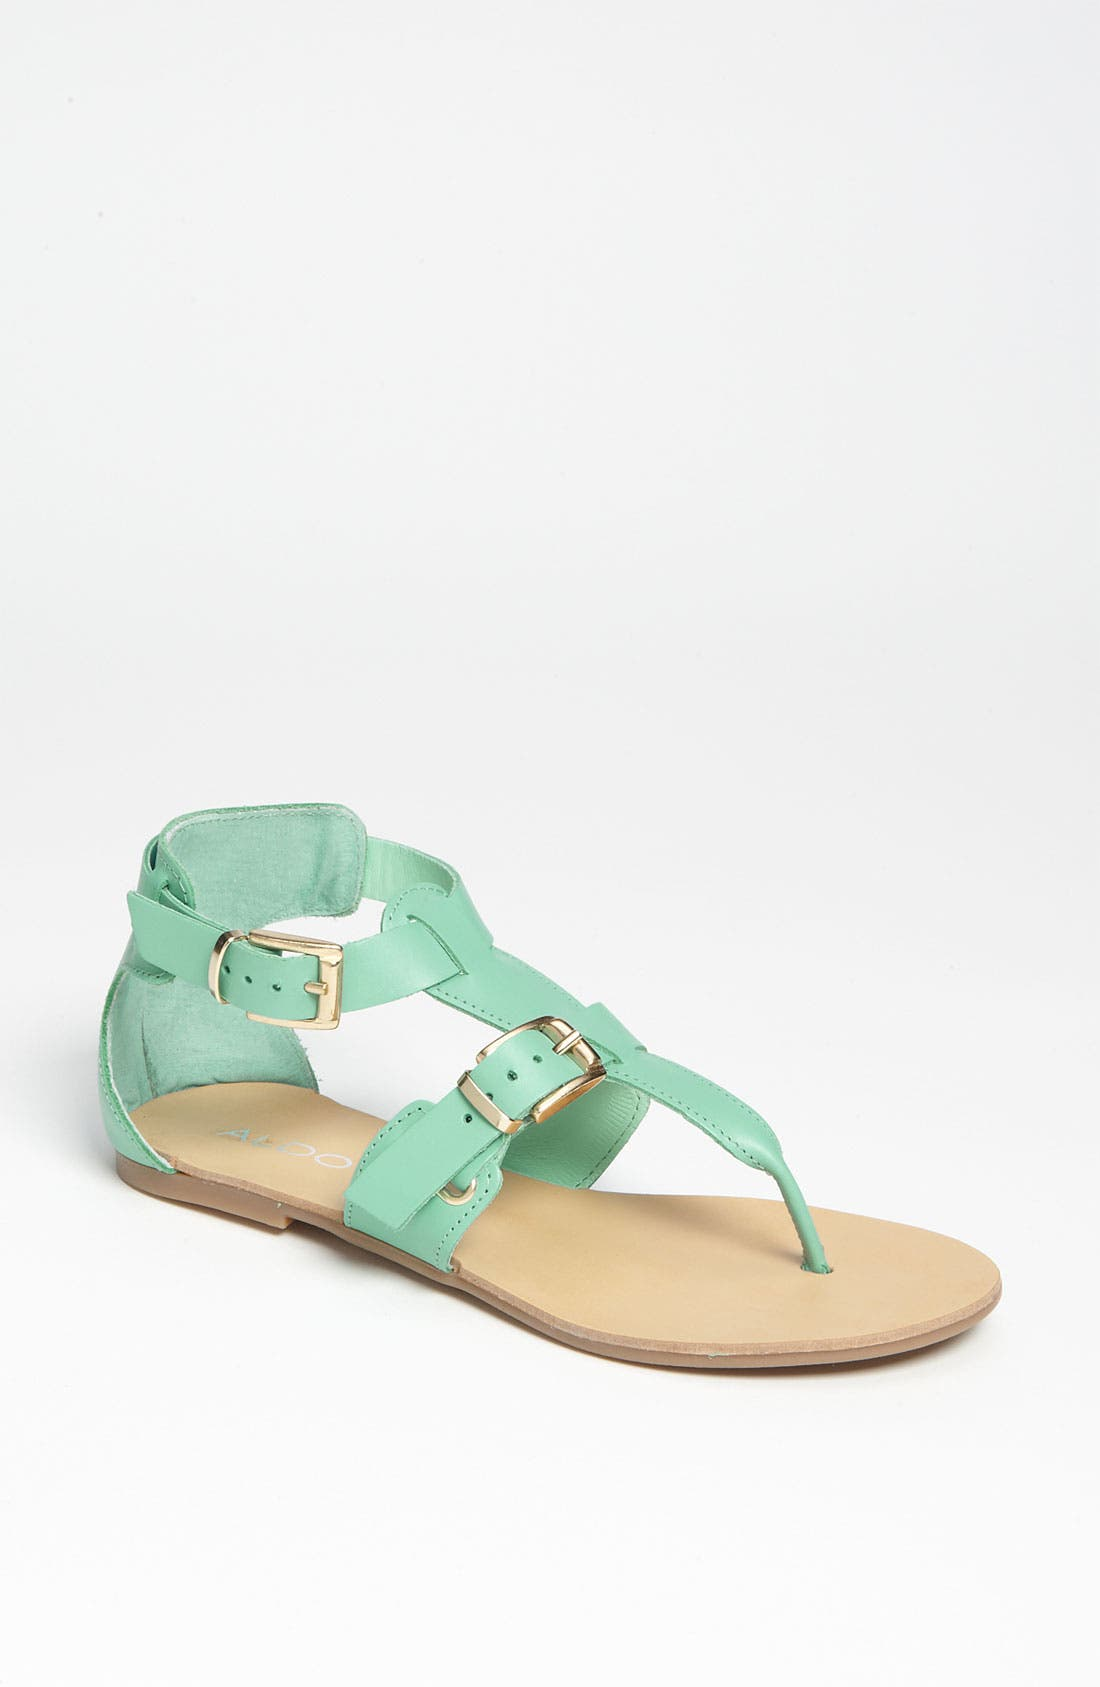 Main Image - ALDO 'Tossie' Sandal